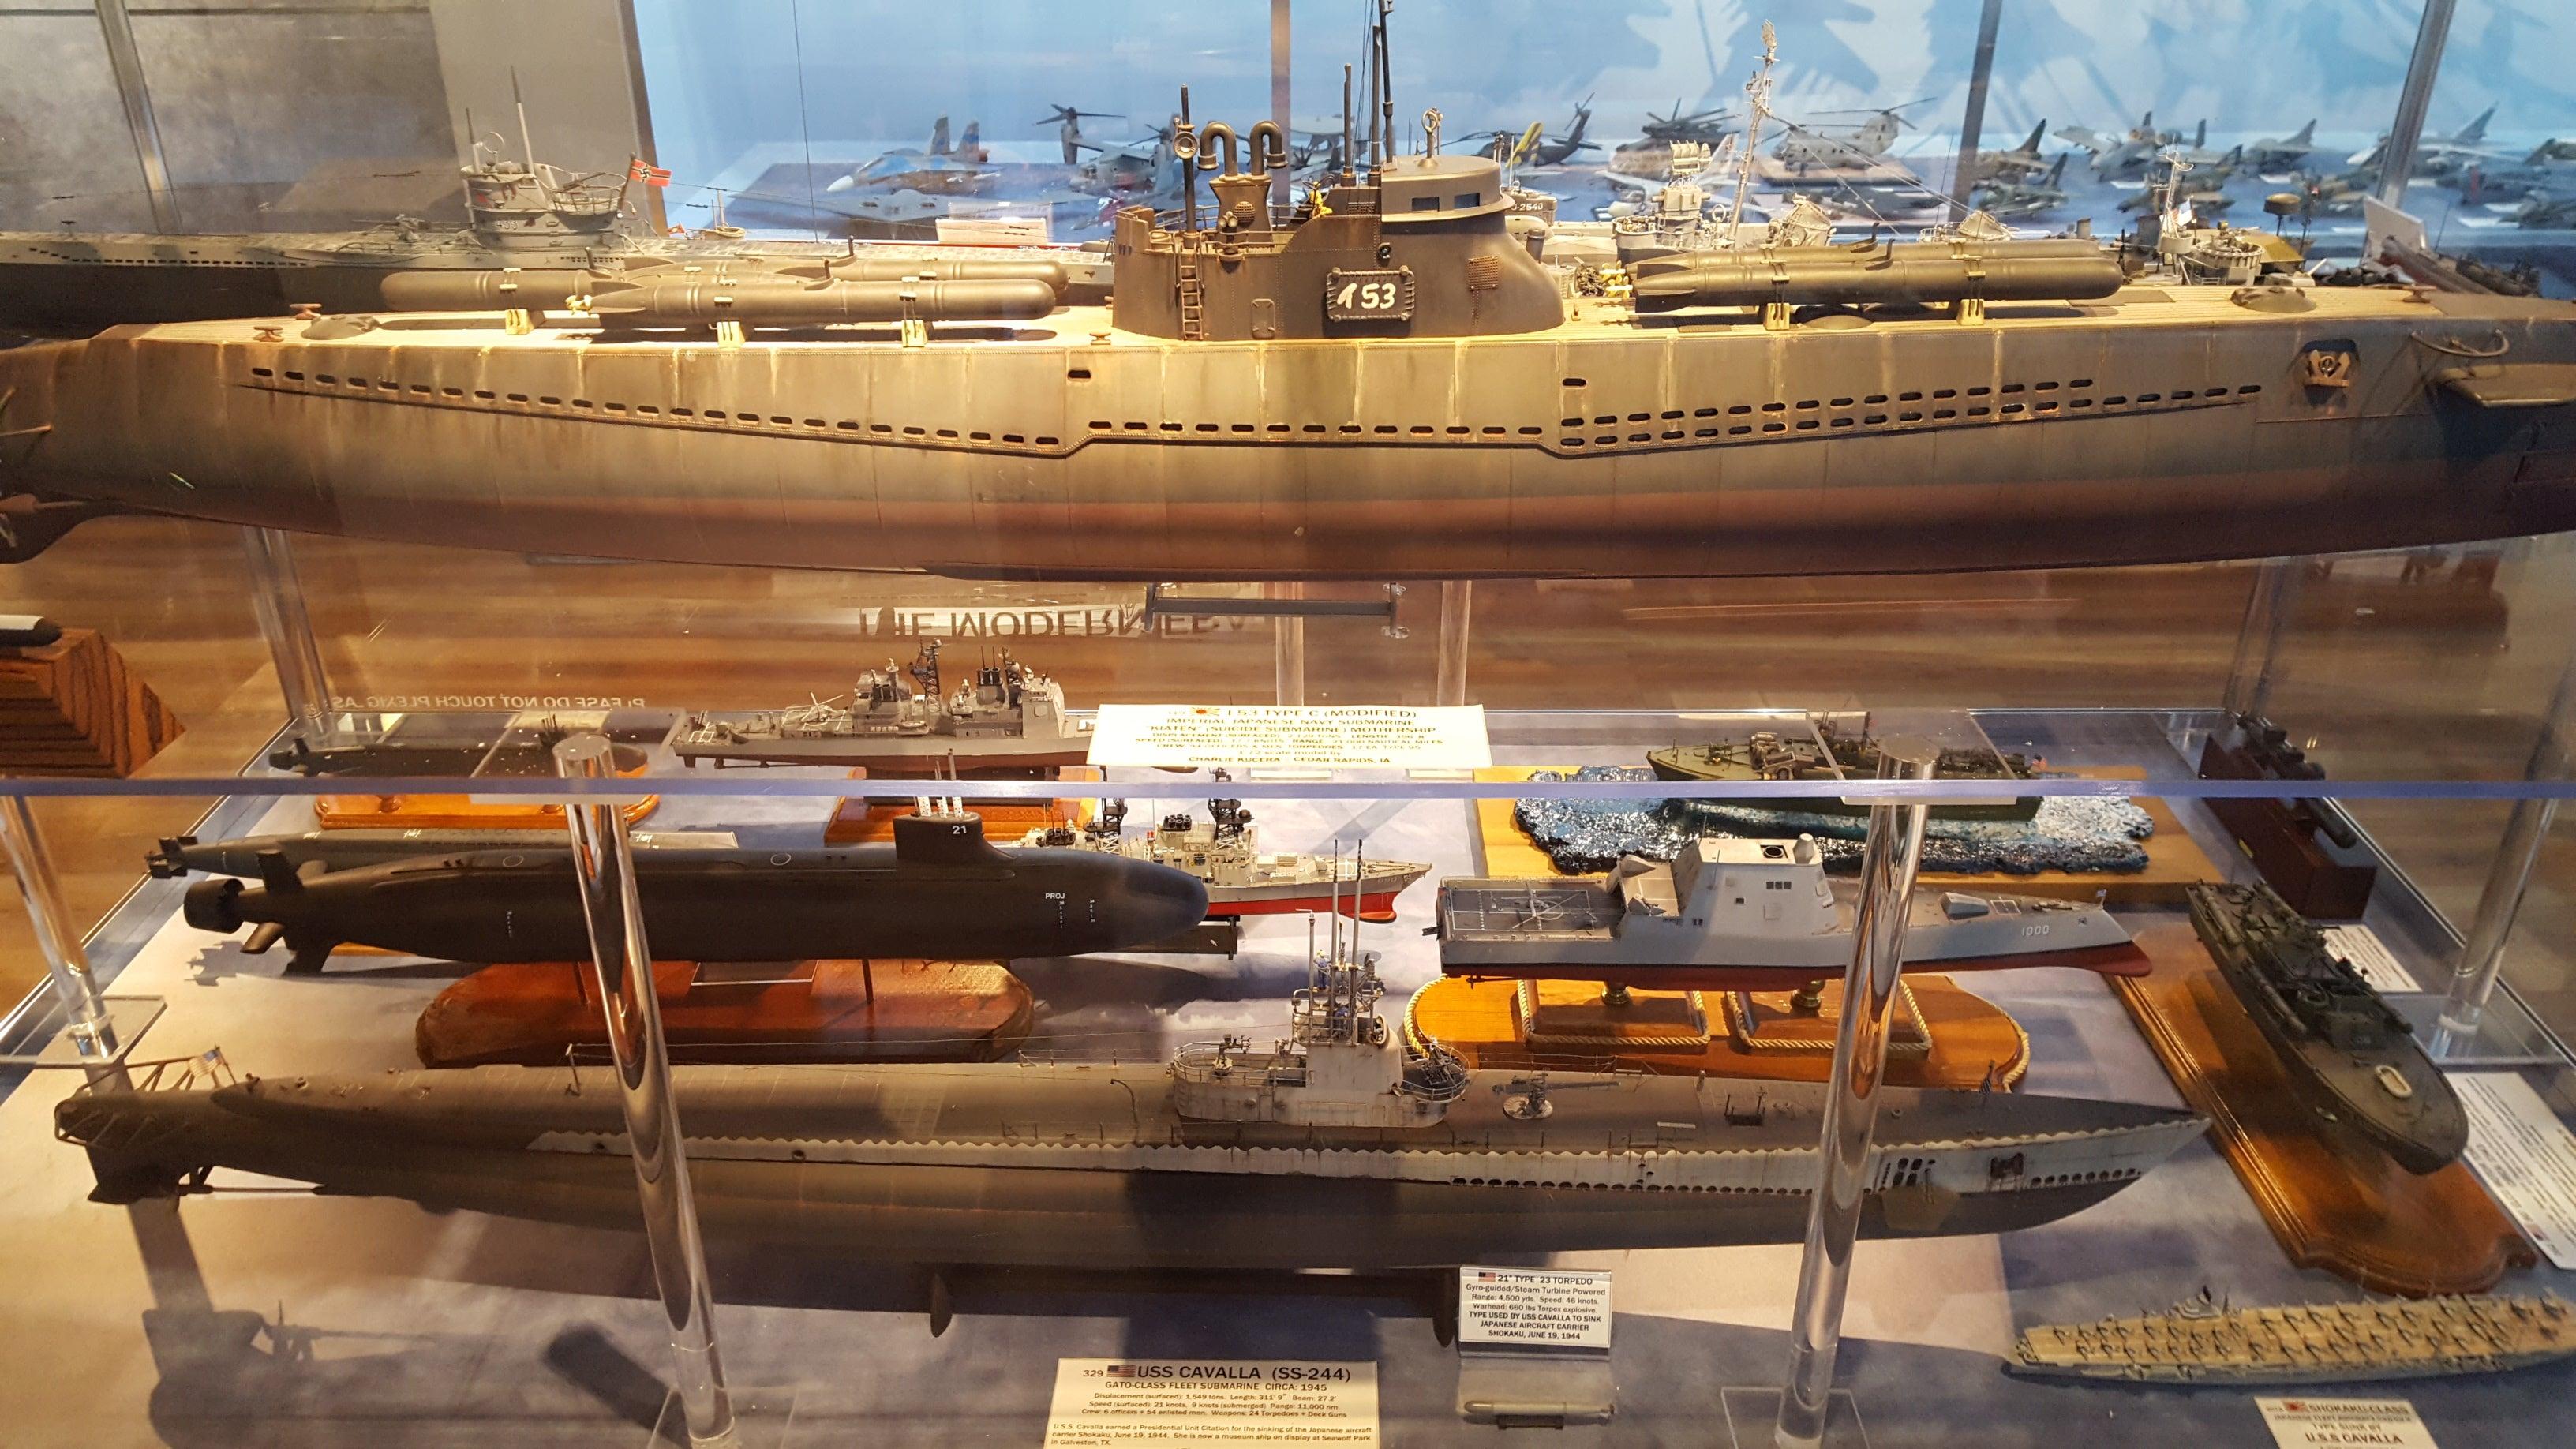 LaLD: the models aboard the USS Lexington